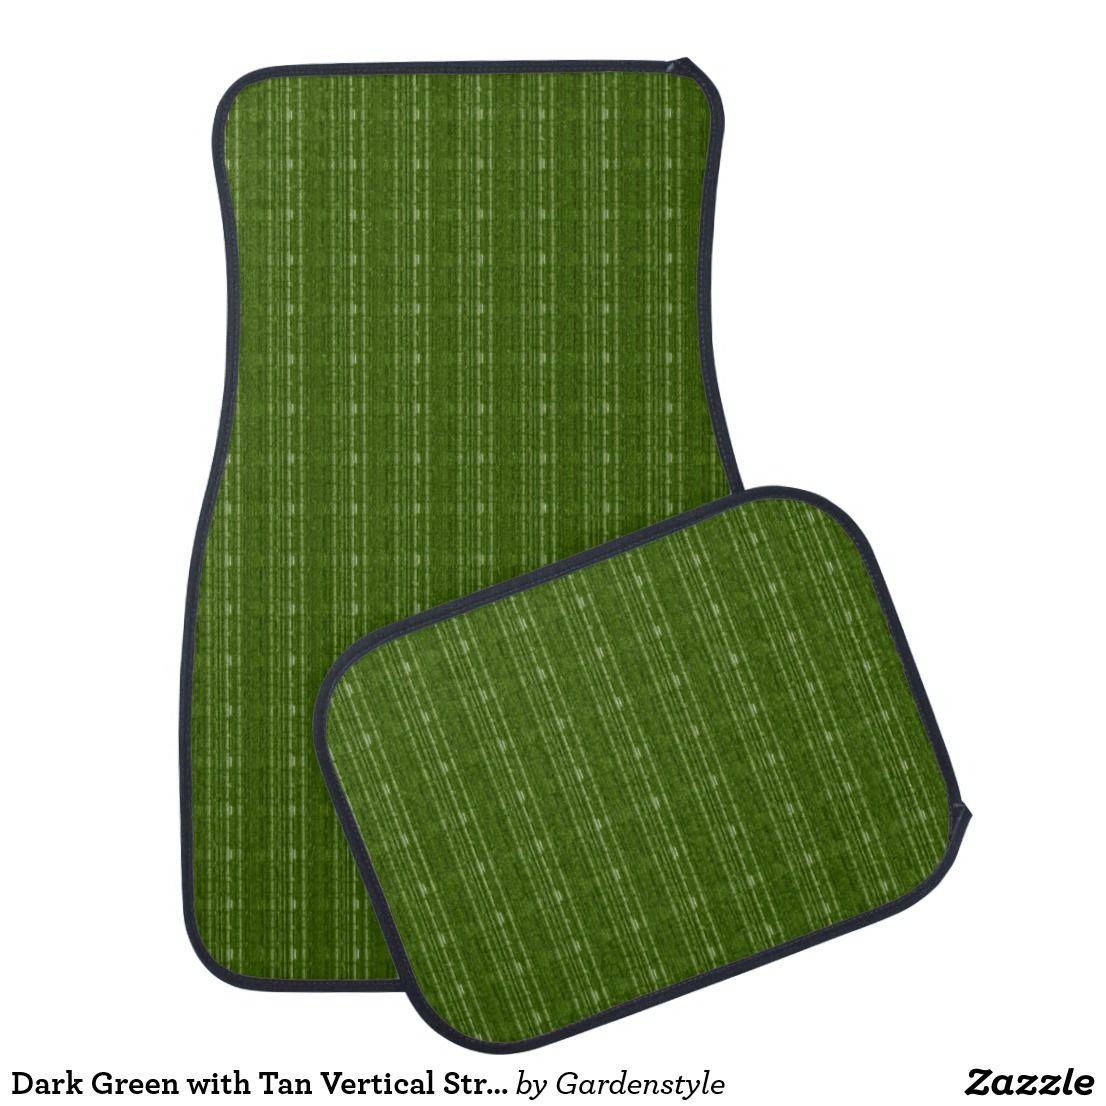 Dark green with tan vertical streak car mats stair